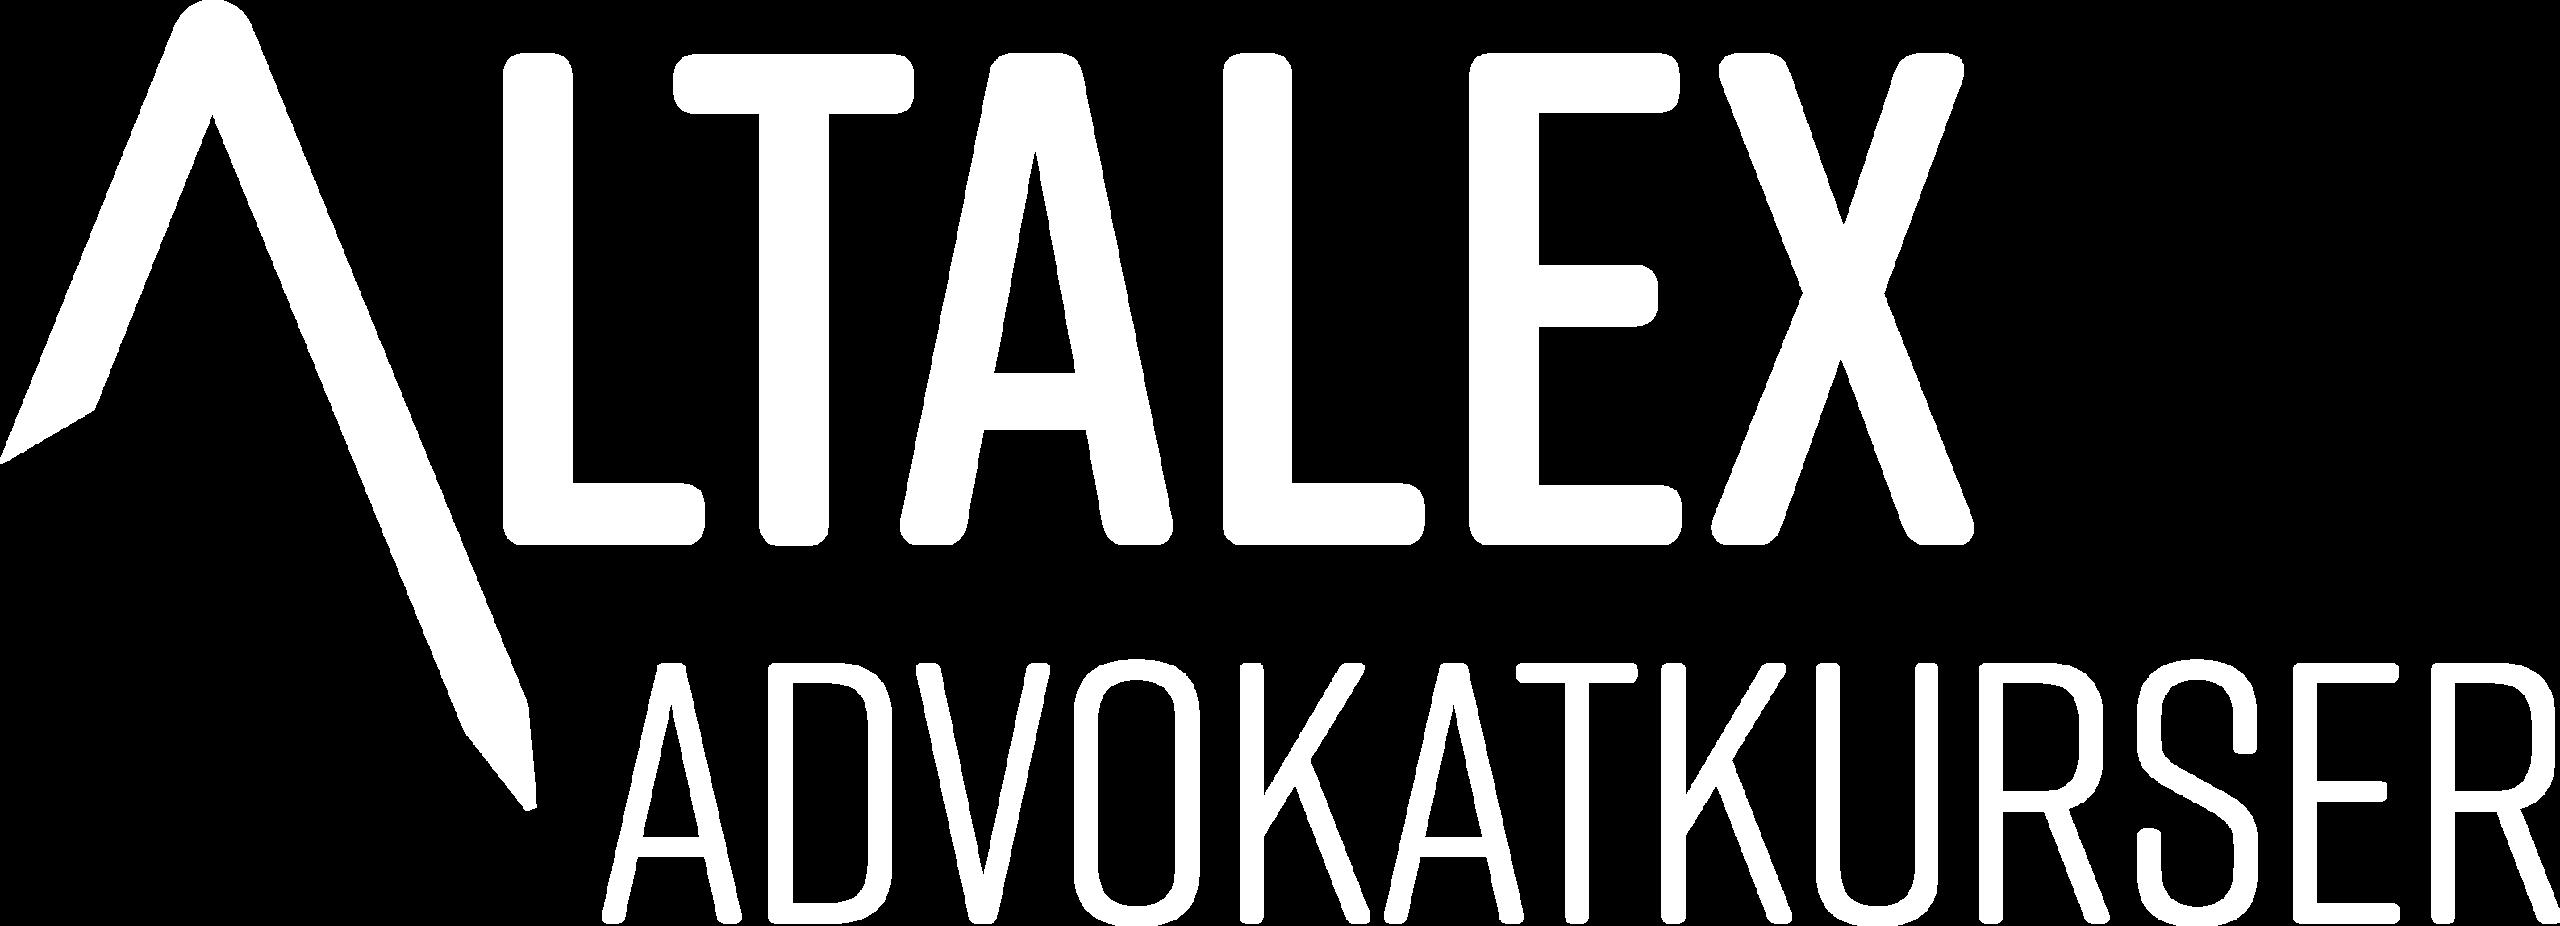 Altalex Advokatkurser